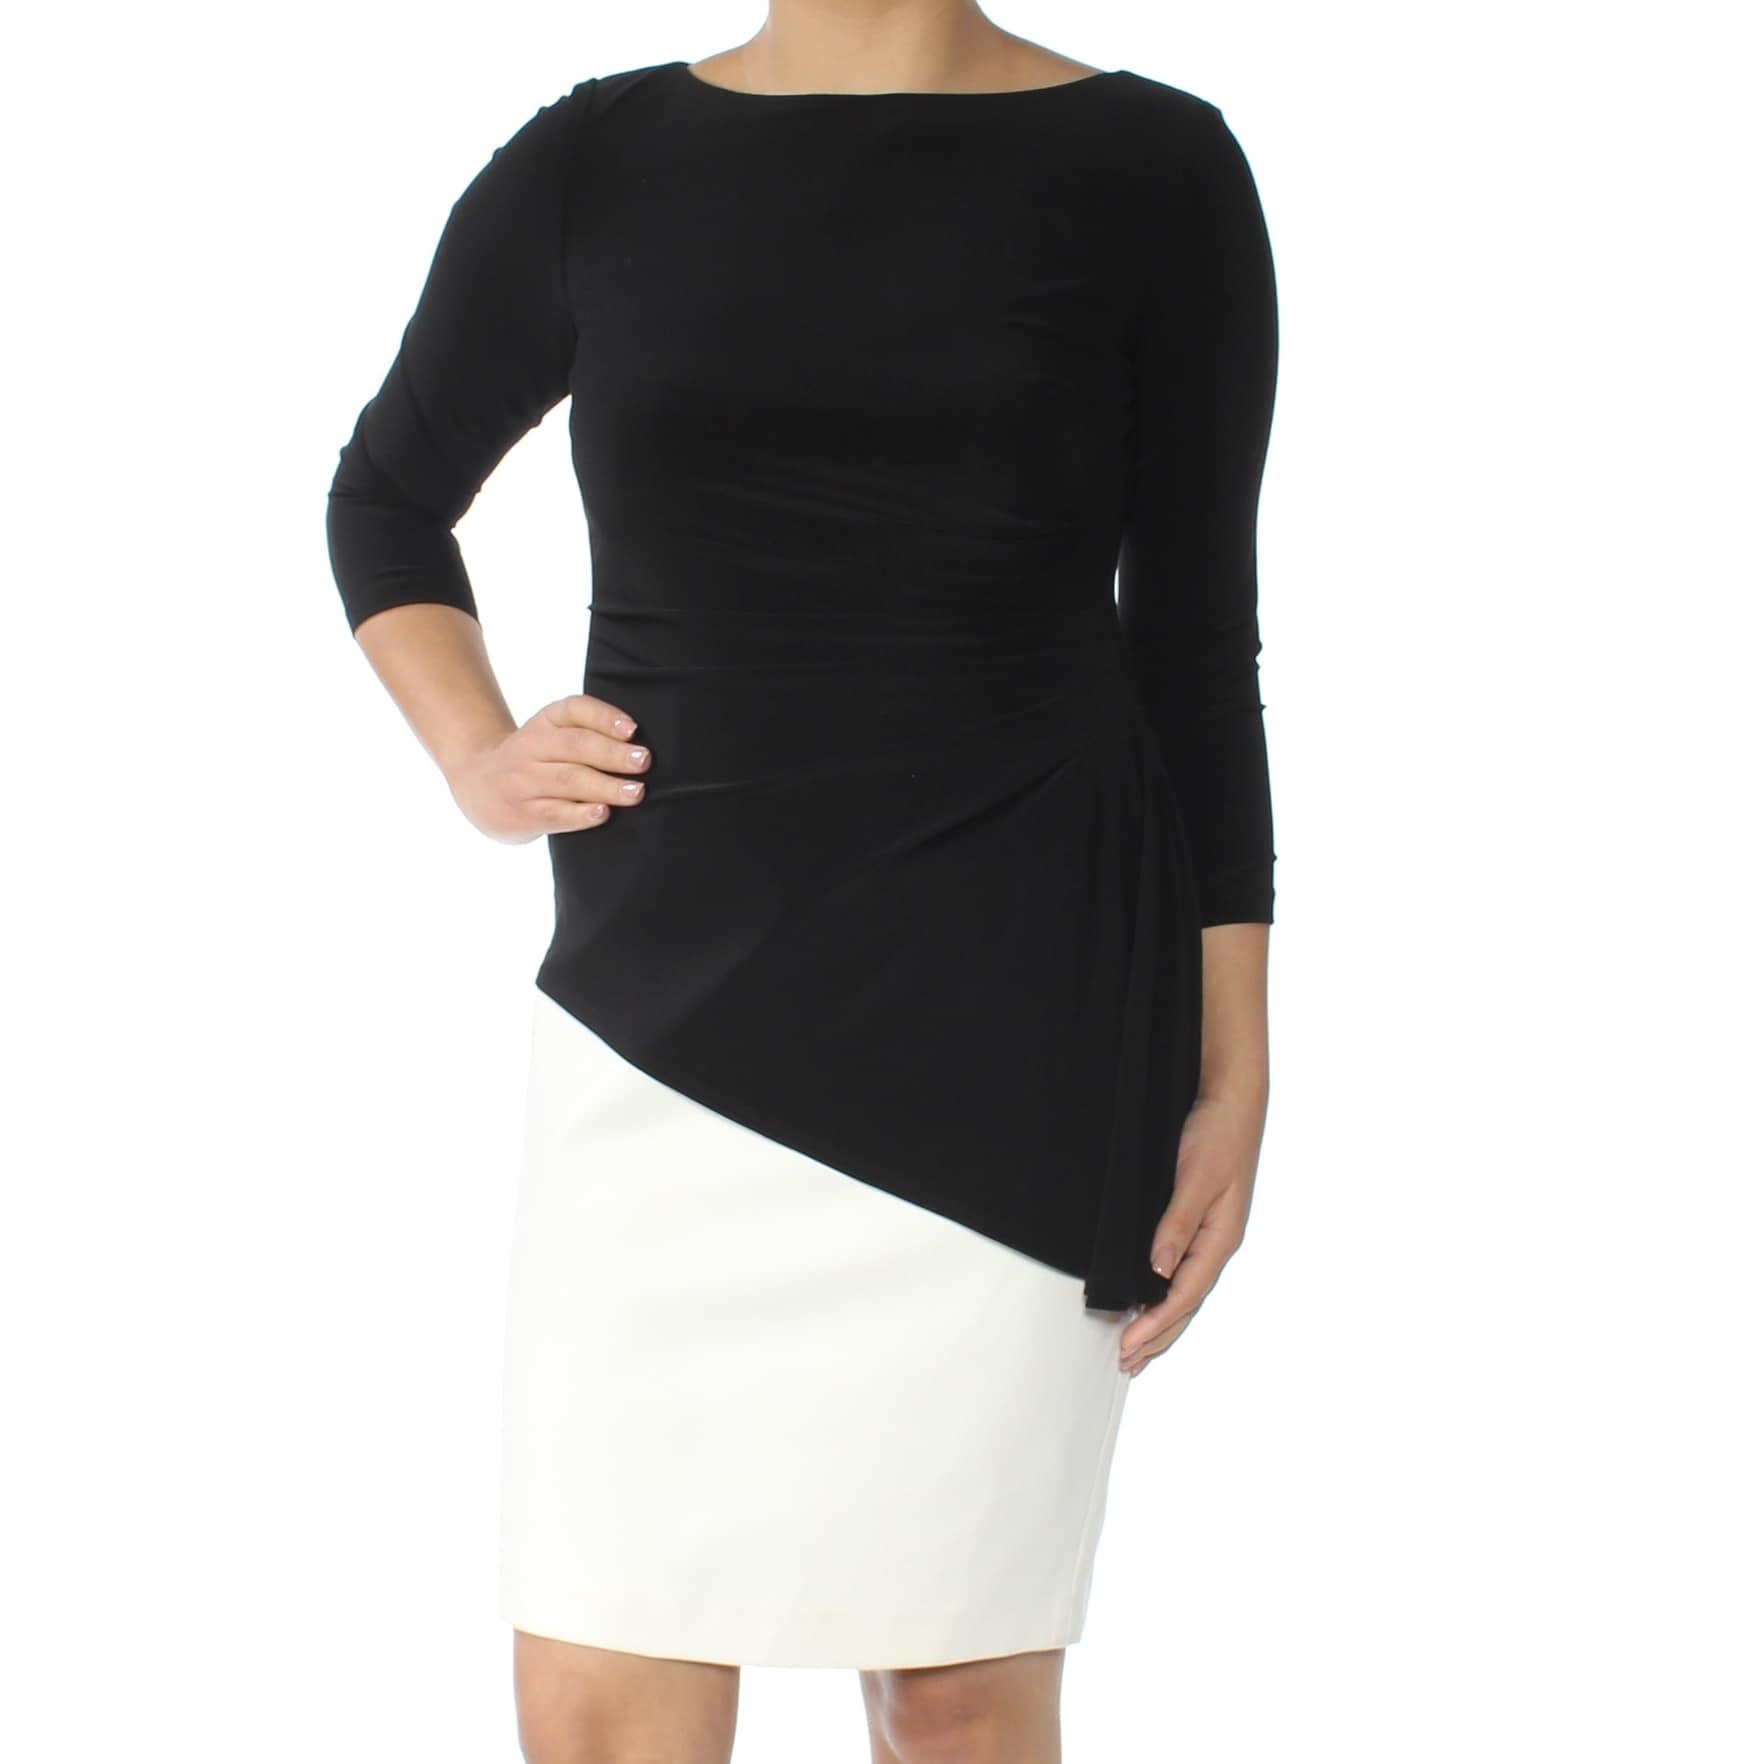 c93c34f3 Black Ralph Lauren Dresses | Find Great Women's Clothing ...